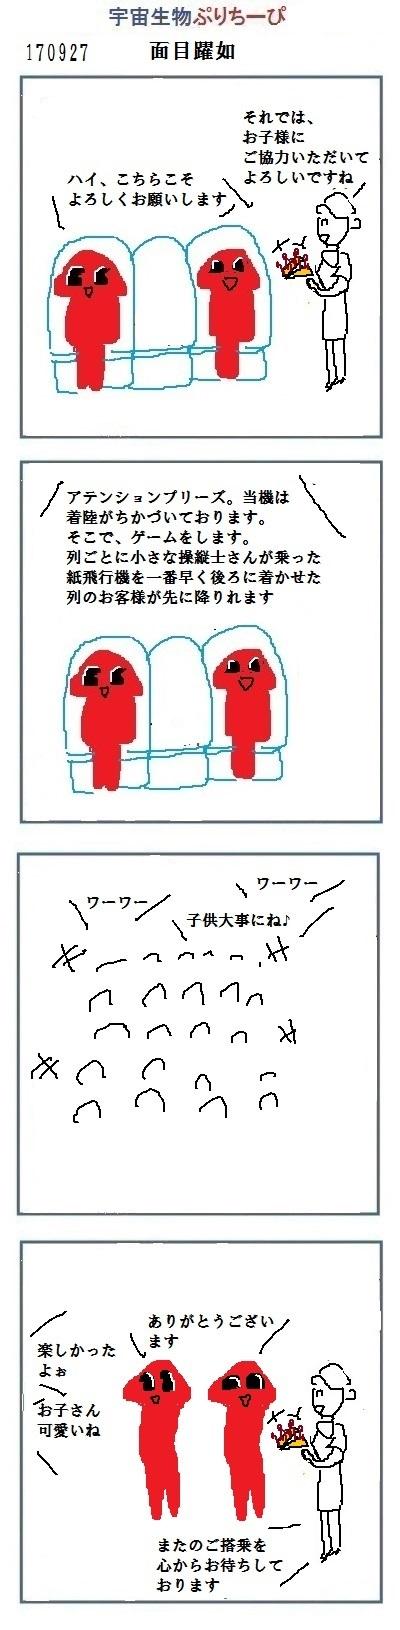 170927-1